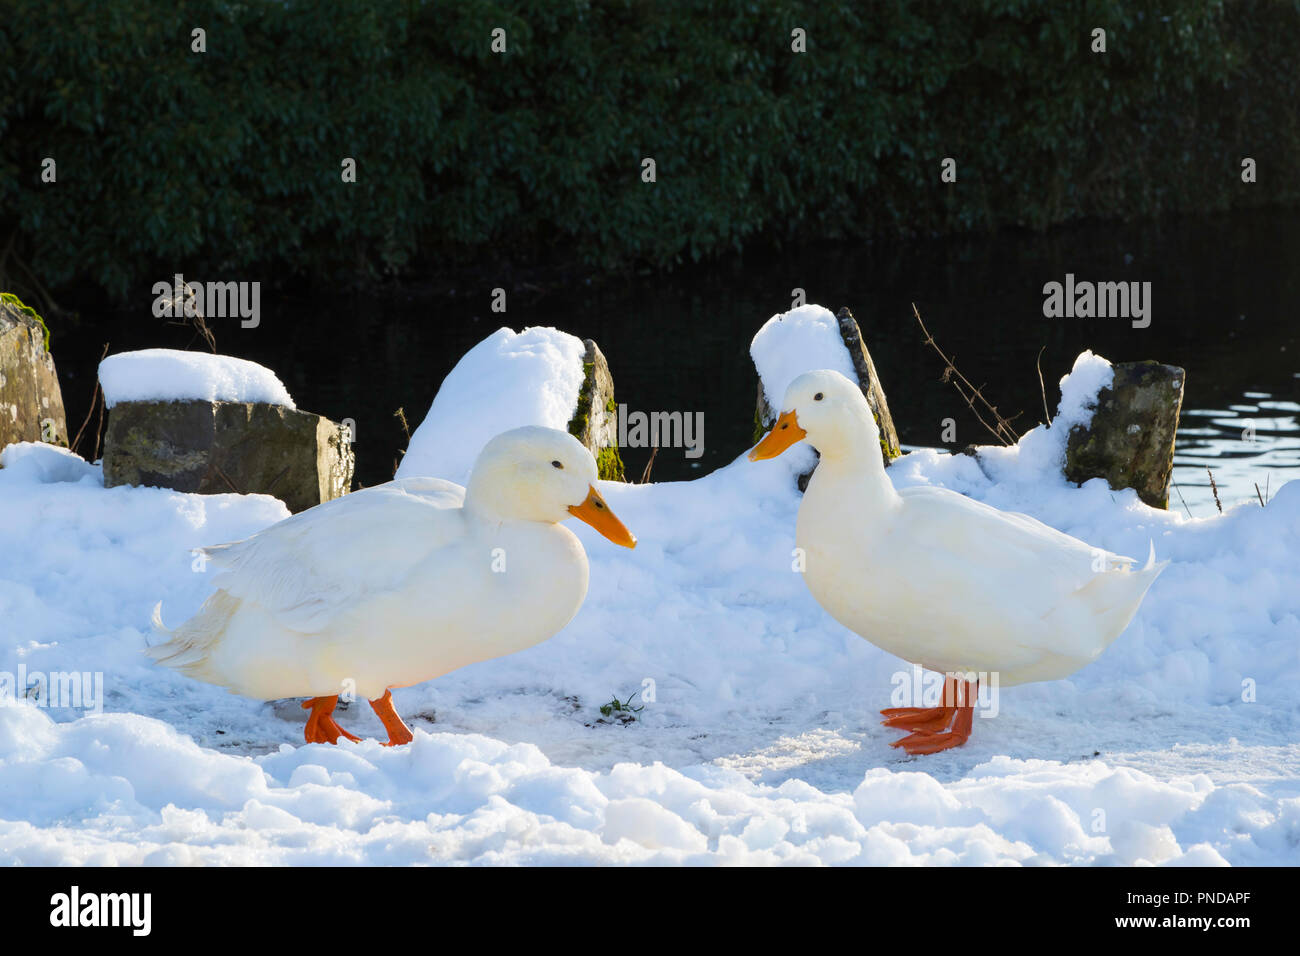 Aylesbury Ducks at Tissington, Debyshire. - Stock Image